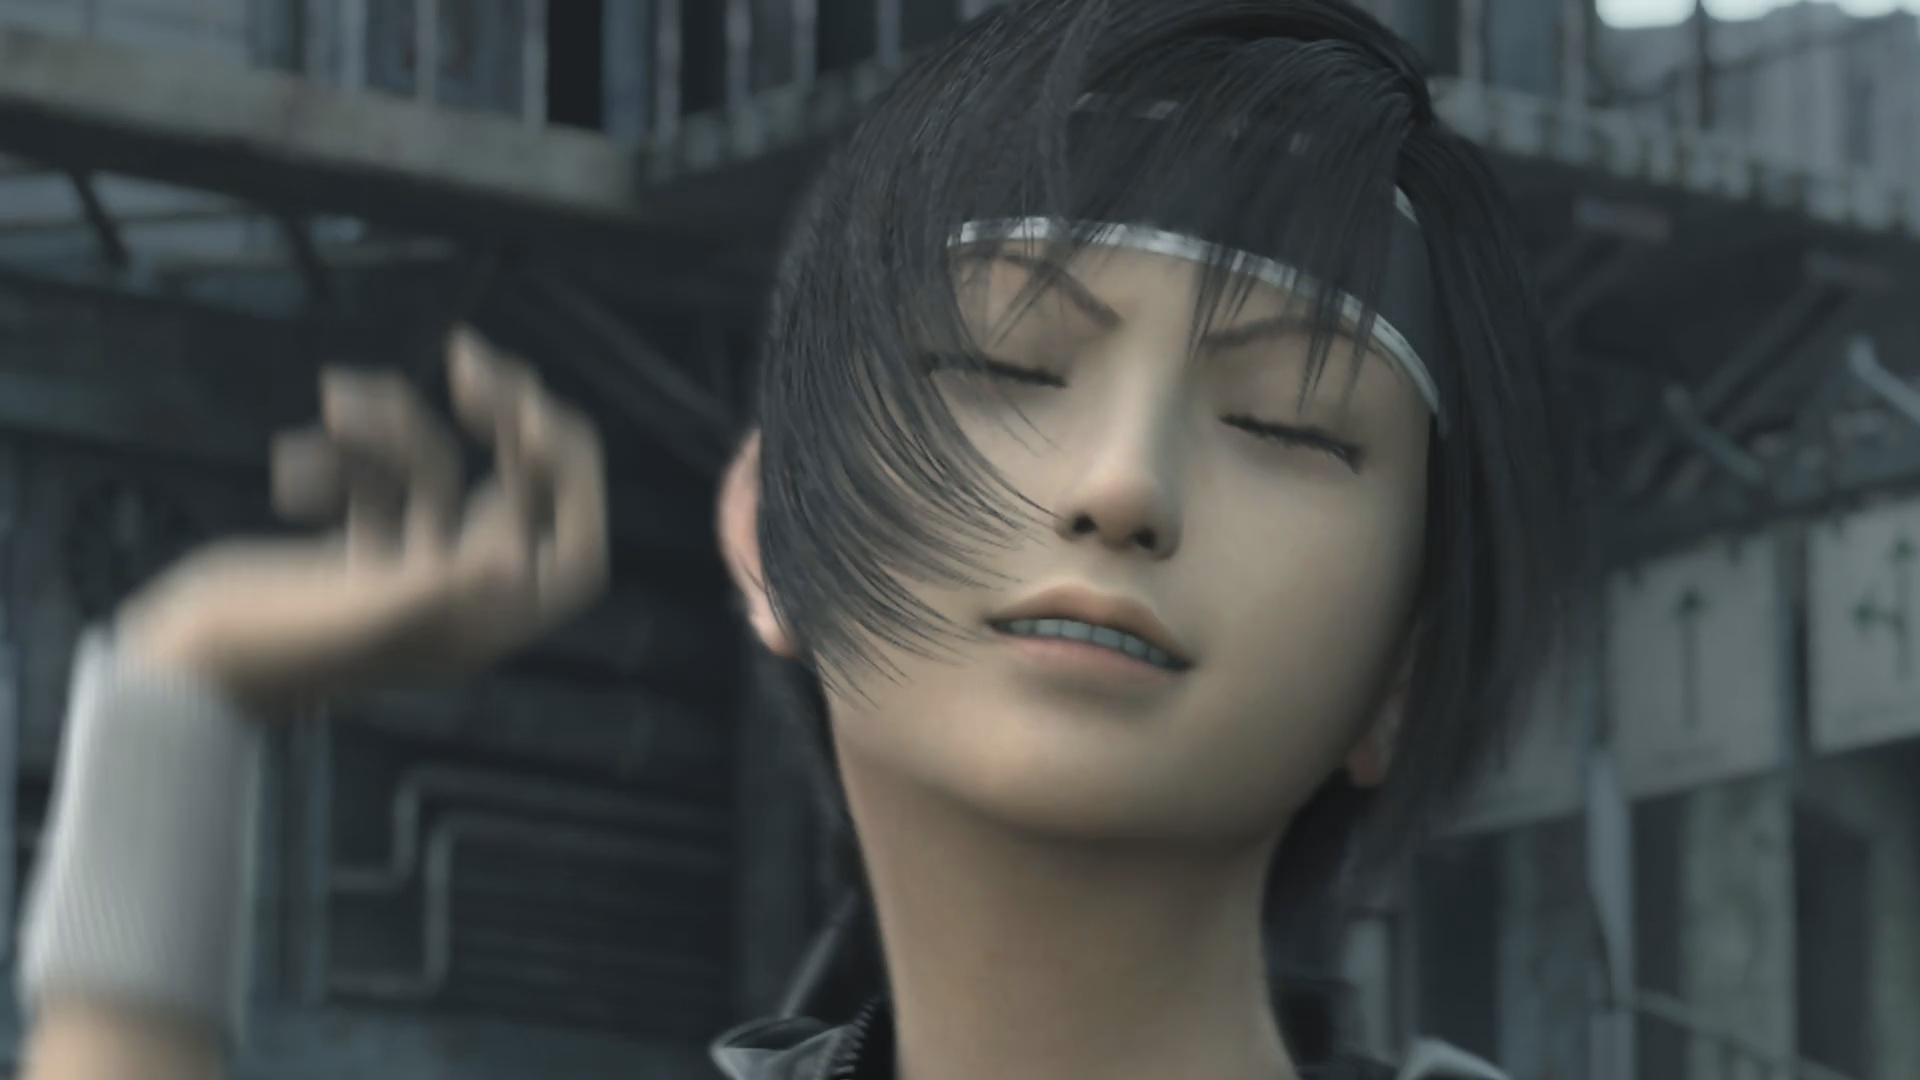 Yuffie Kisaragi from Final Fantasy VII Advent Children